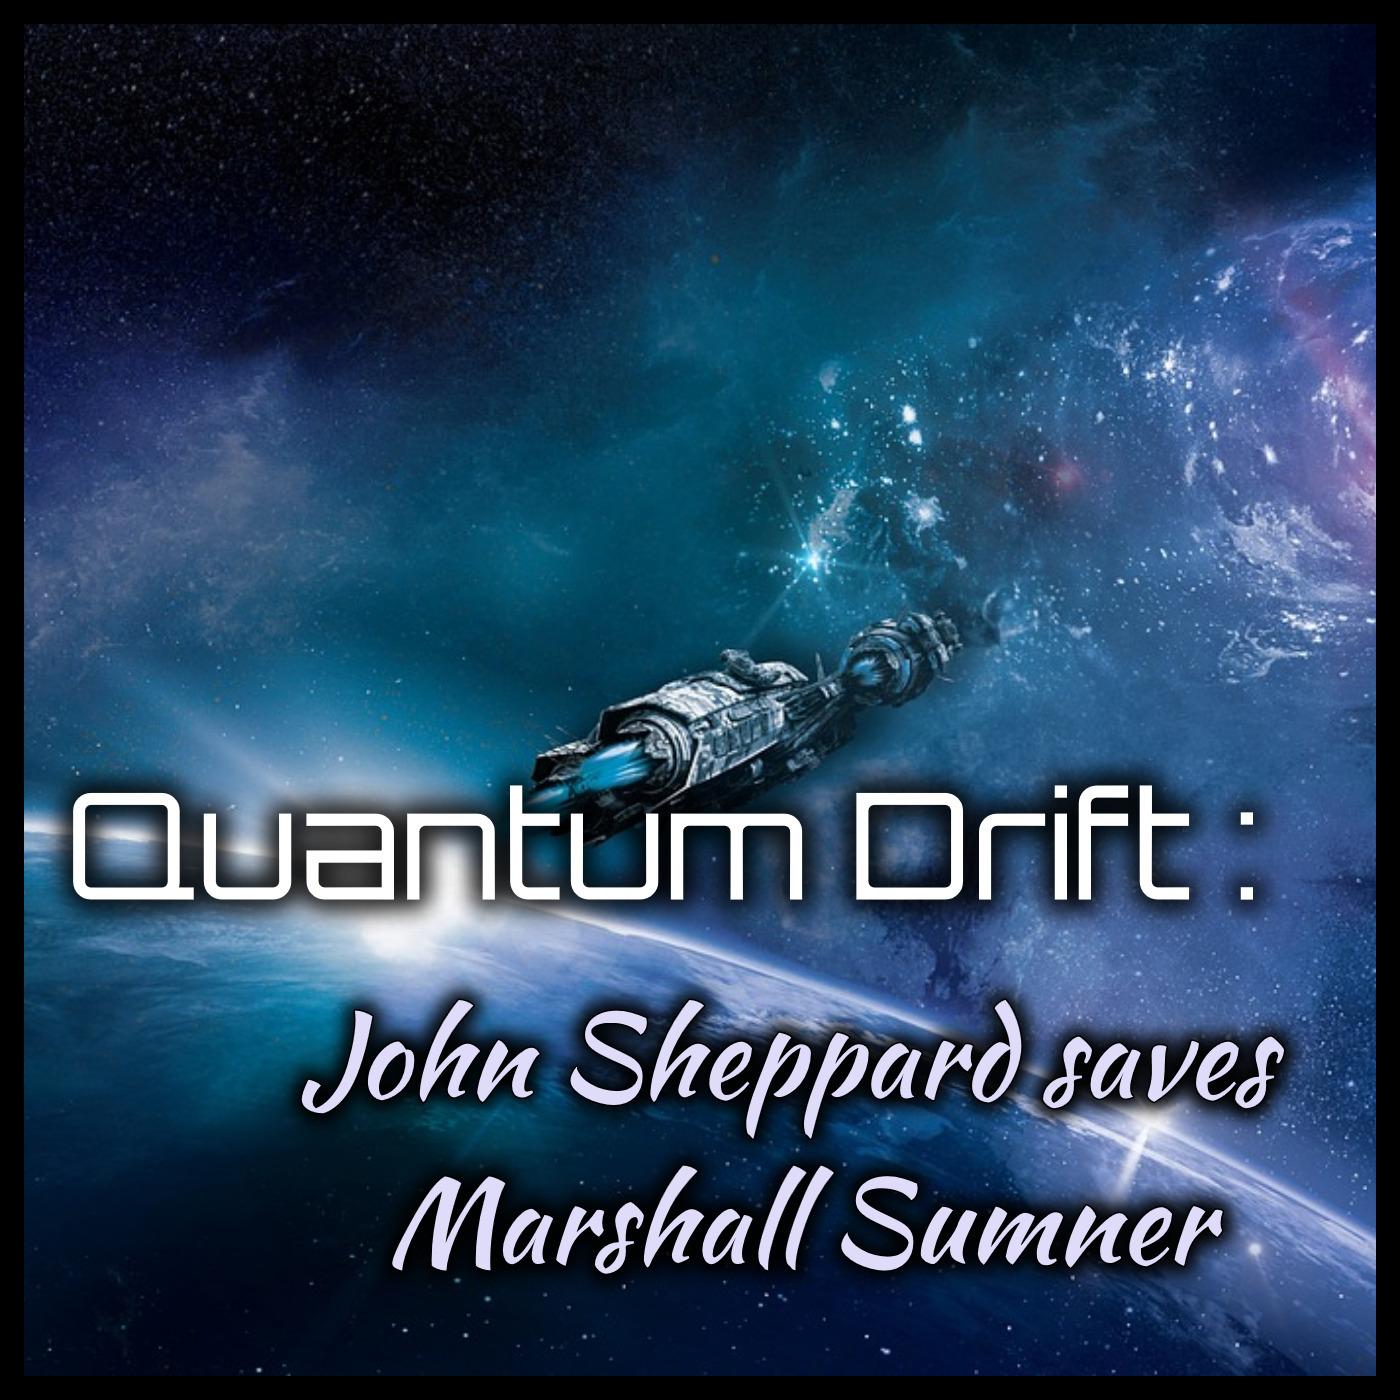 Quantum Drift: John Sheppard Saves Marshall Sumner